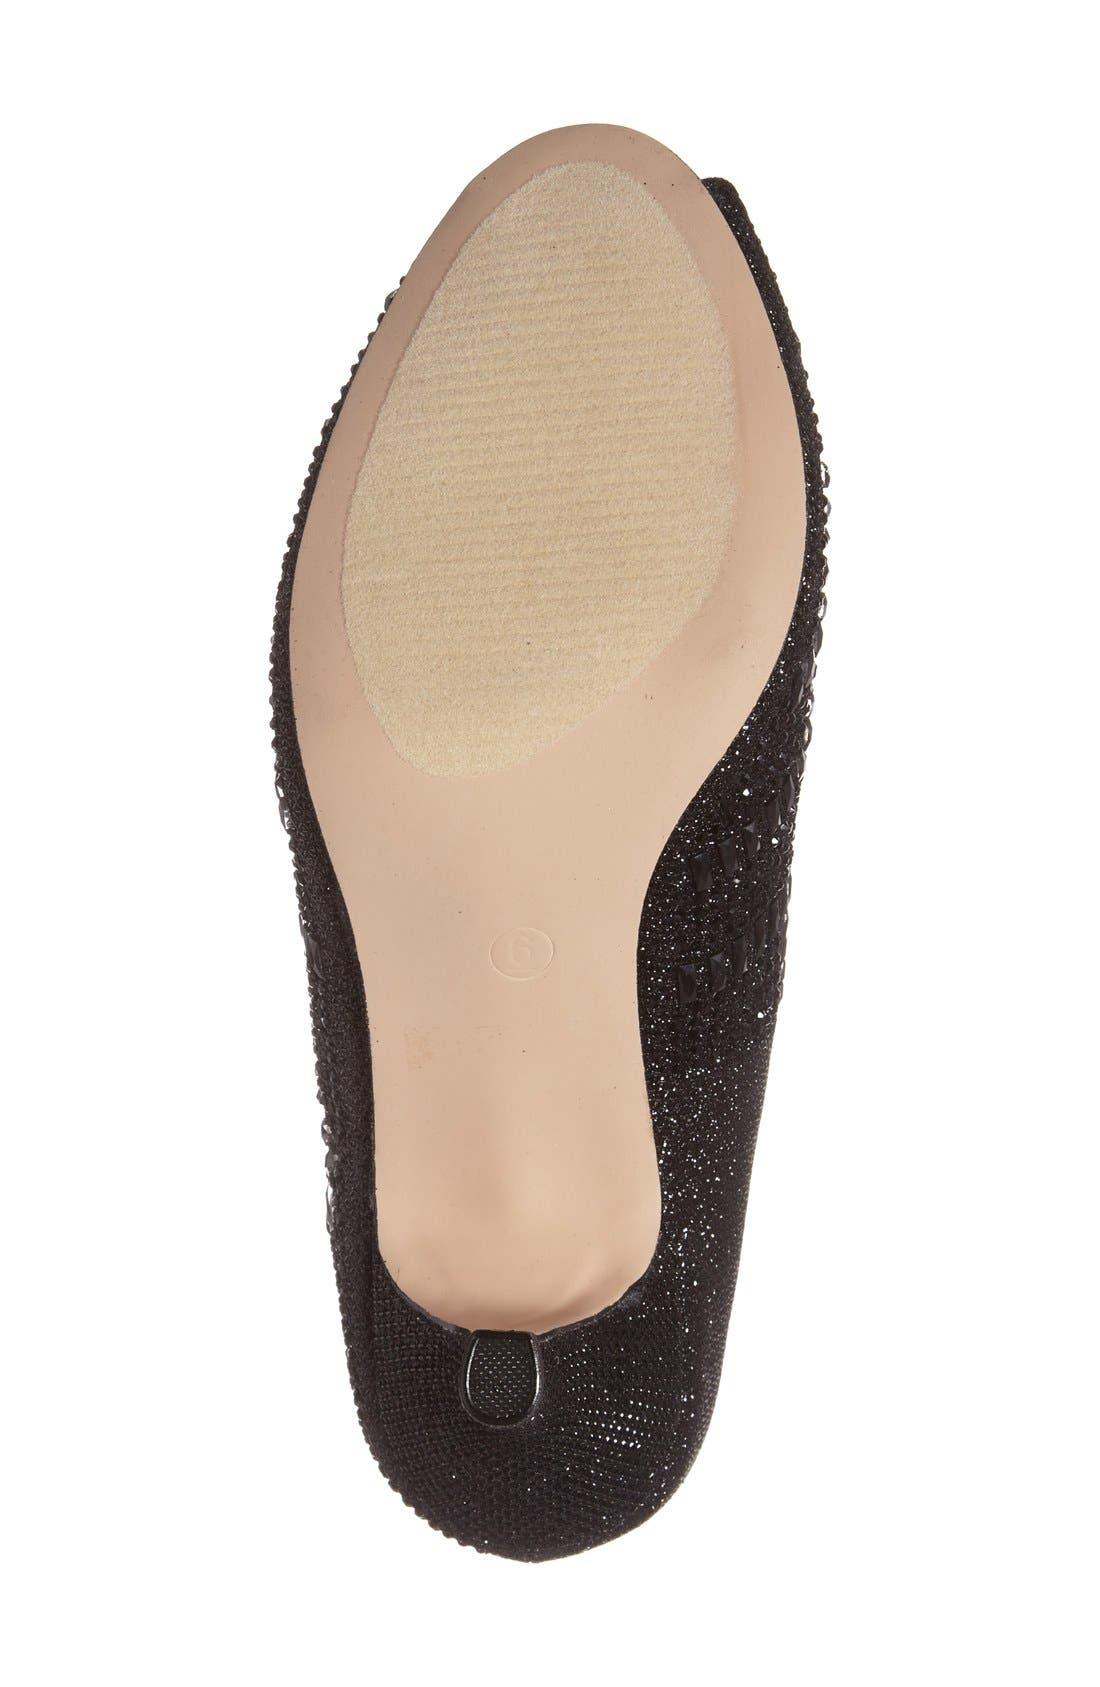 'Belinda' Crystal Embellished Peep Toe Pump,                             Alternate thumbnail 4, color,                             001